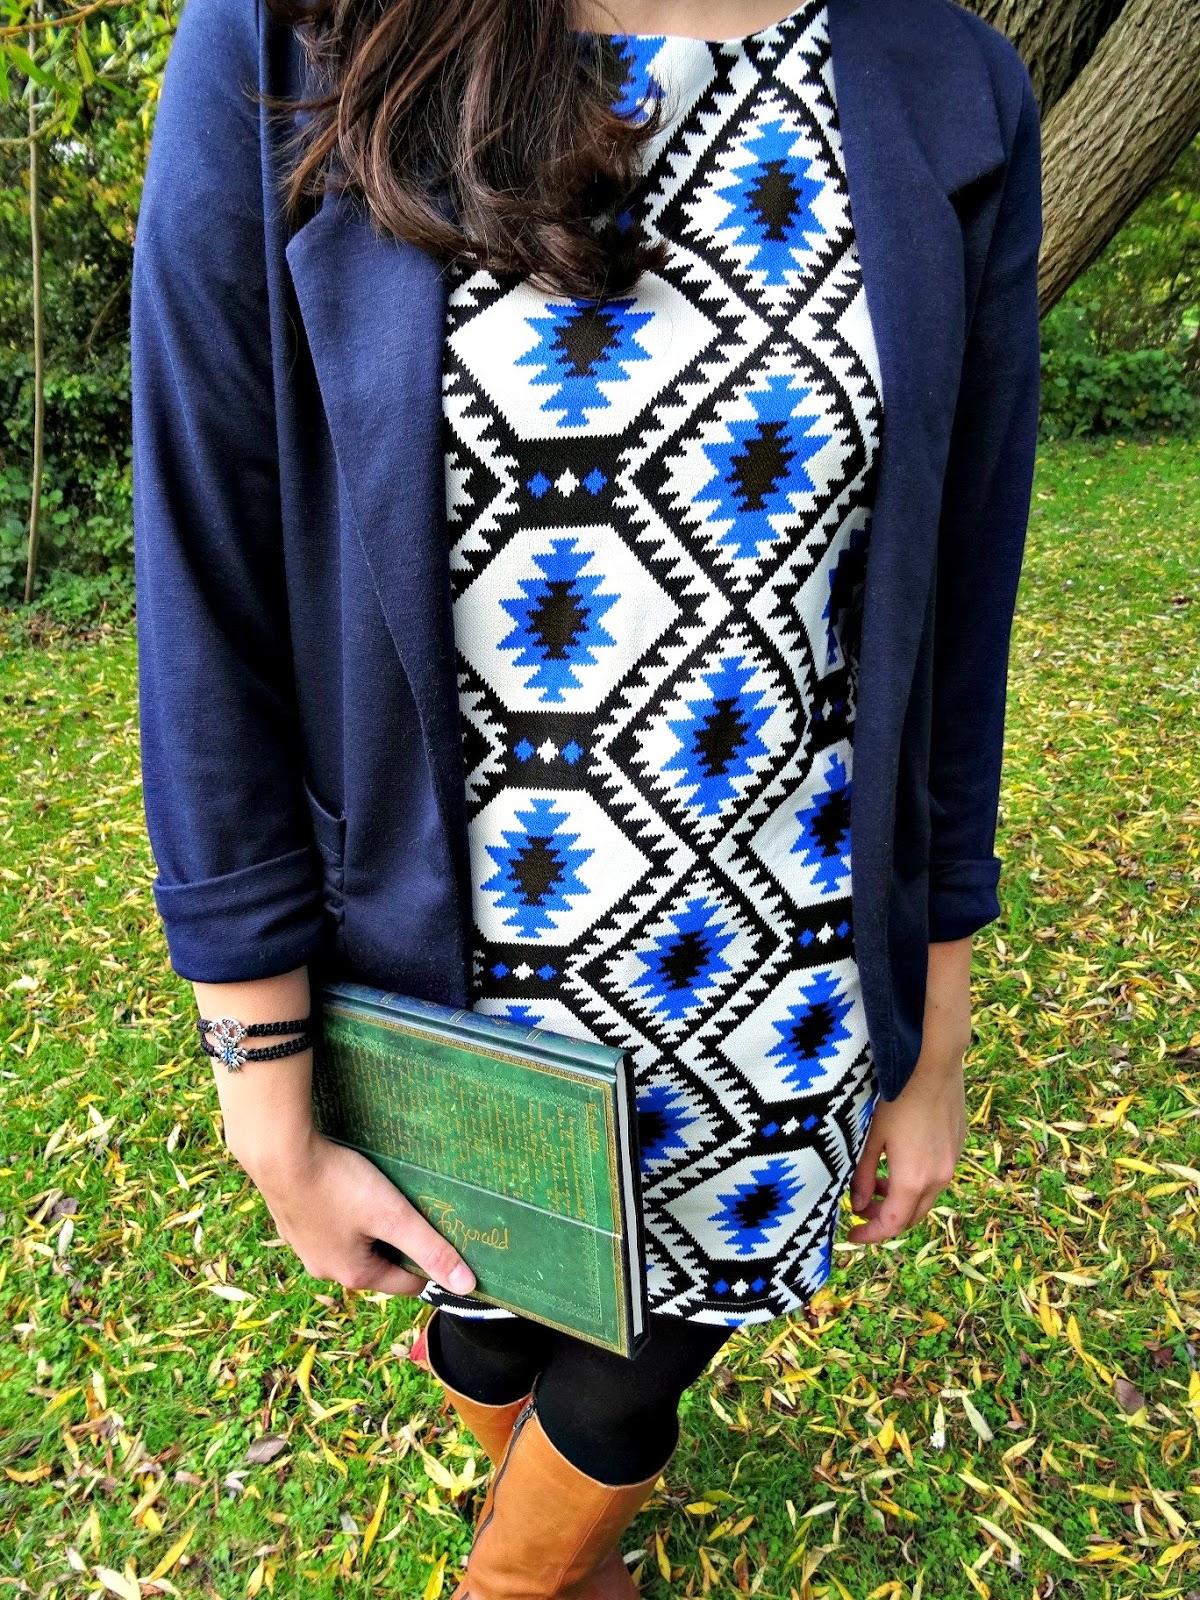 Celeb Look Fashion Post blazer and dress combination